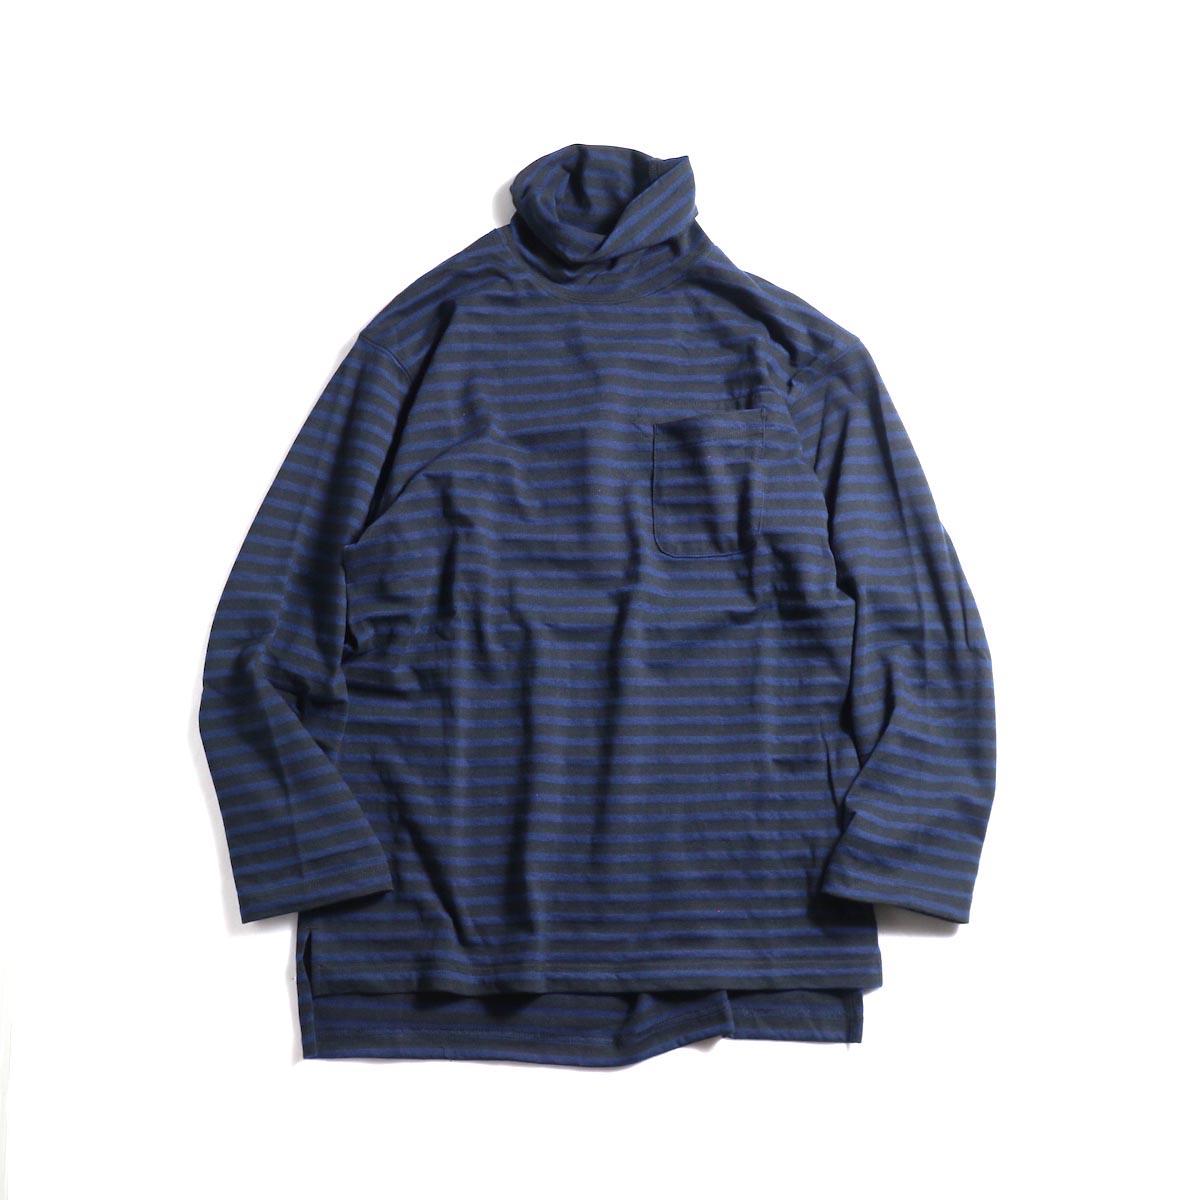 Engineered Garments / LS Turtleneck Shirt (Black/Navy)